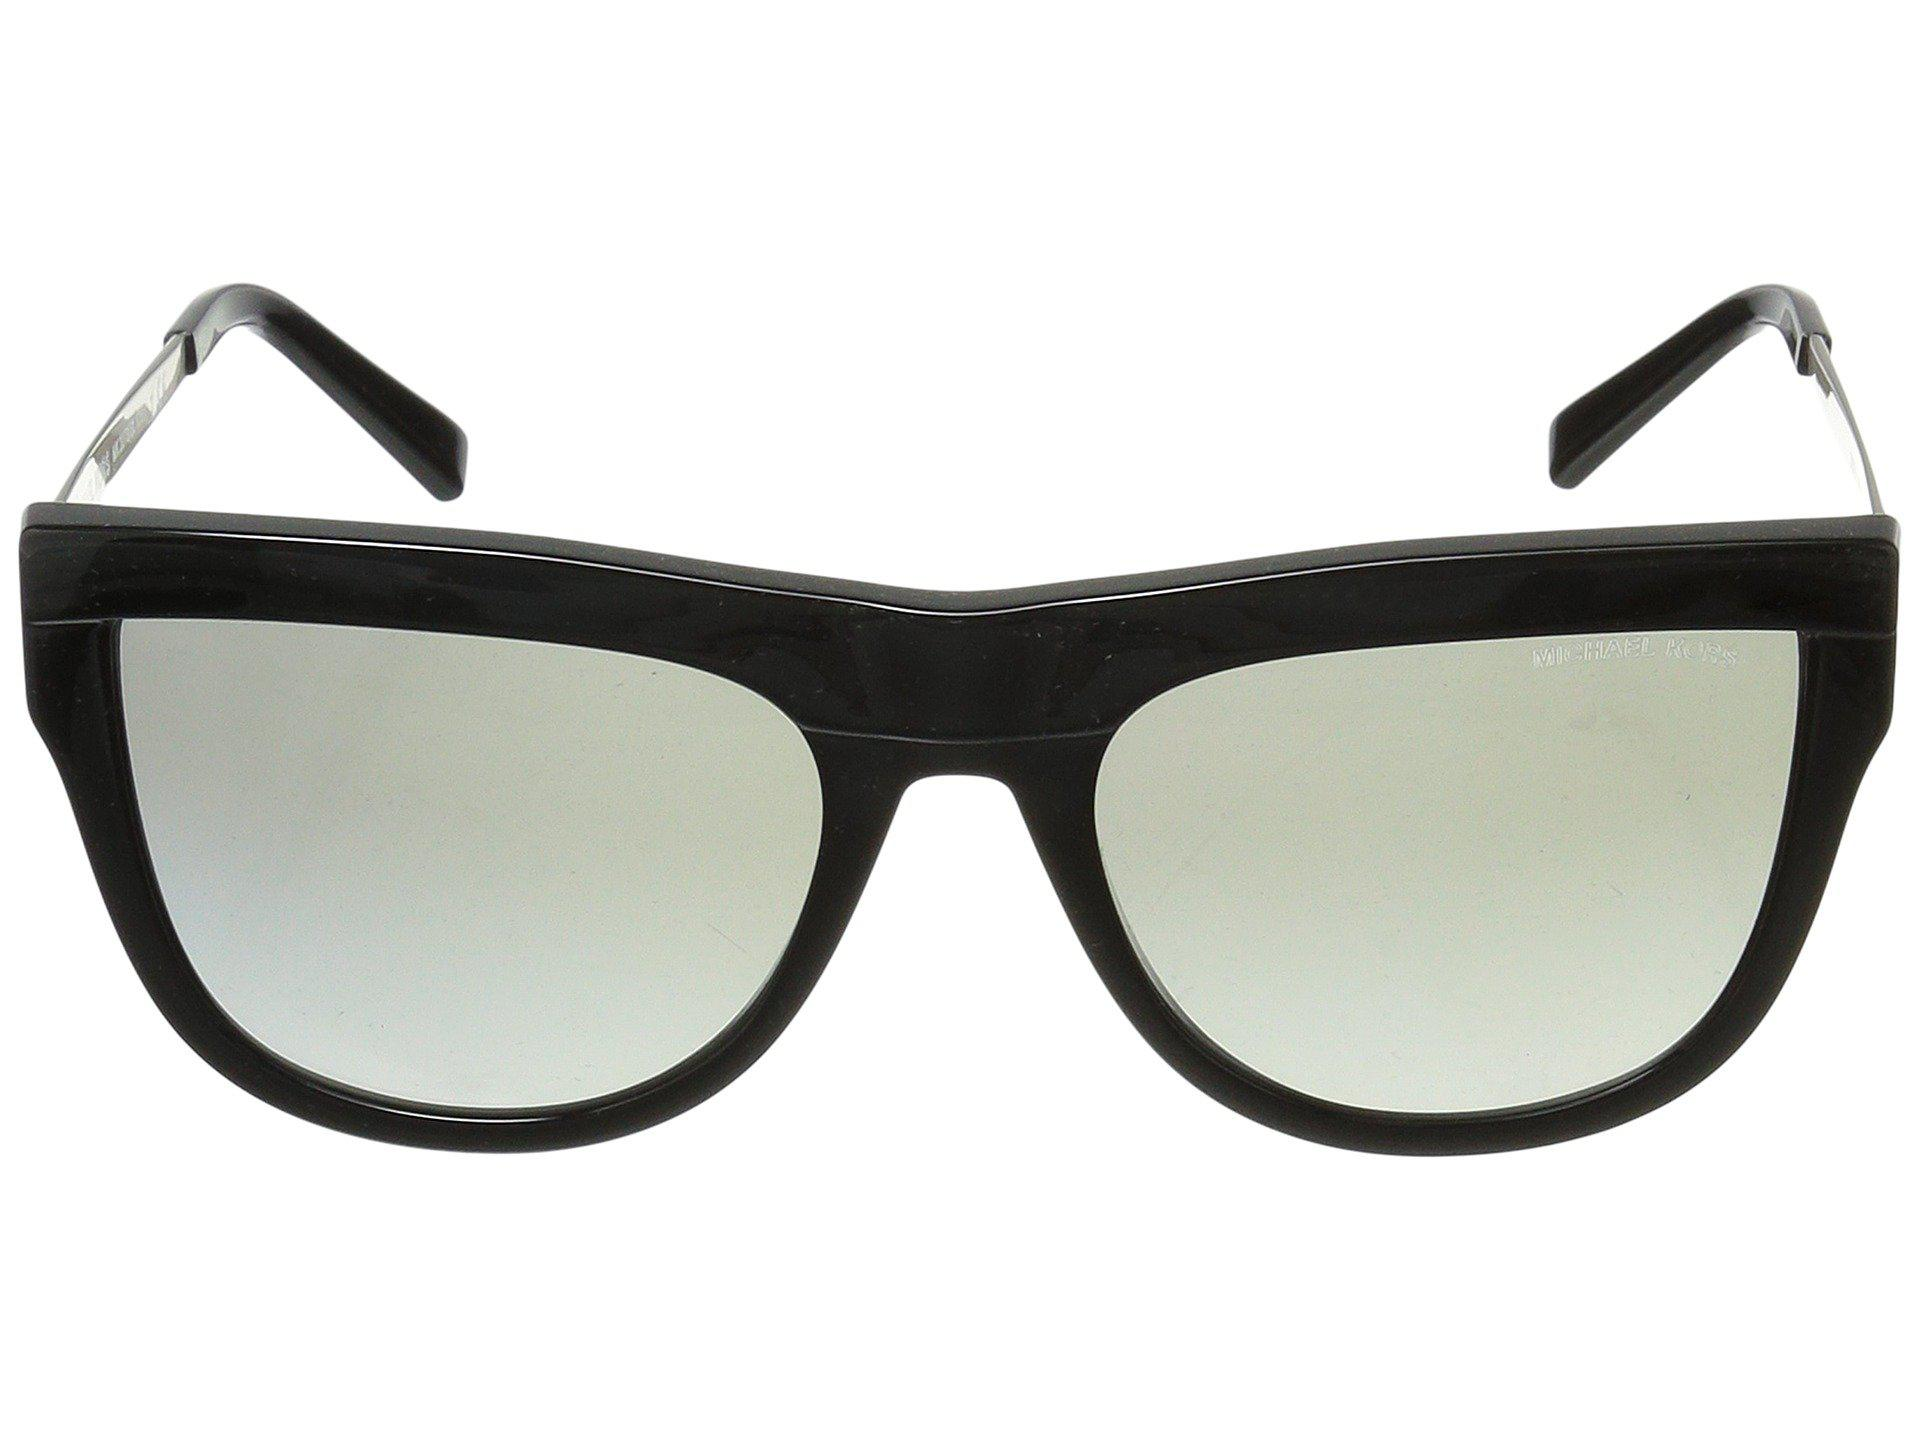 2e56e9a745e Michael Kors - St. Kitts 0mk2073 56mm (black Injected grey Gradient)  Fashion. View fullscreen